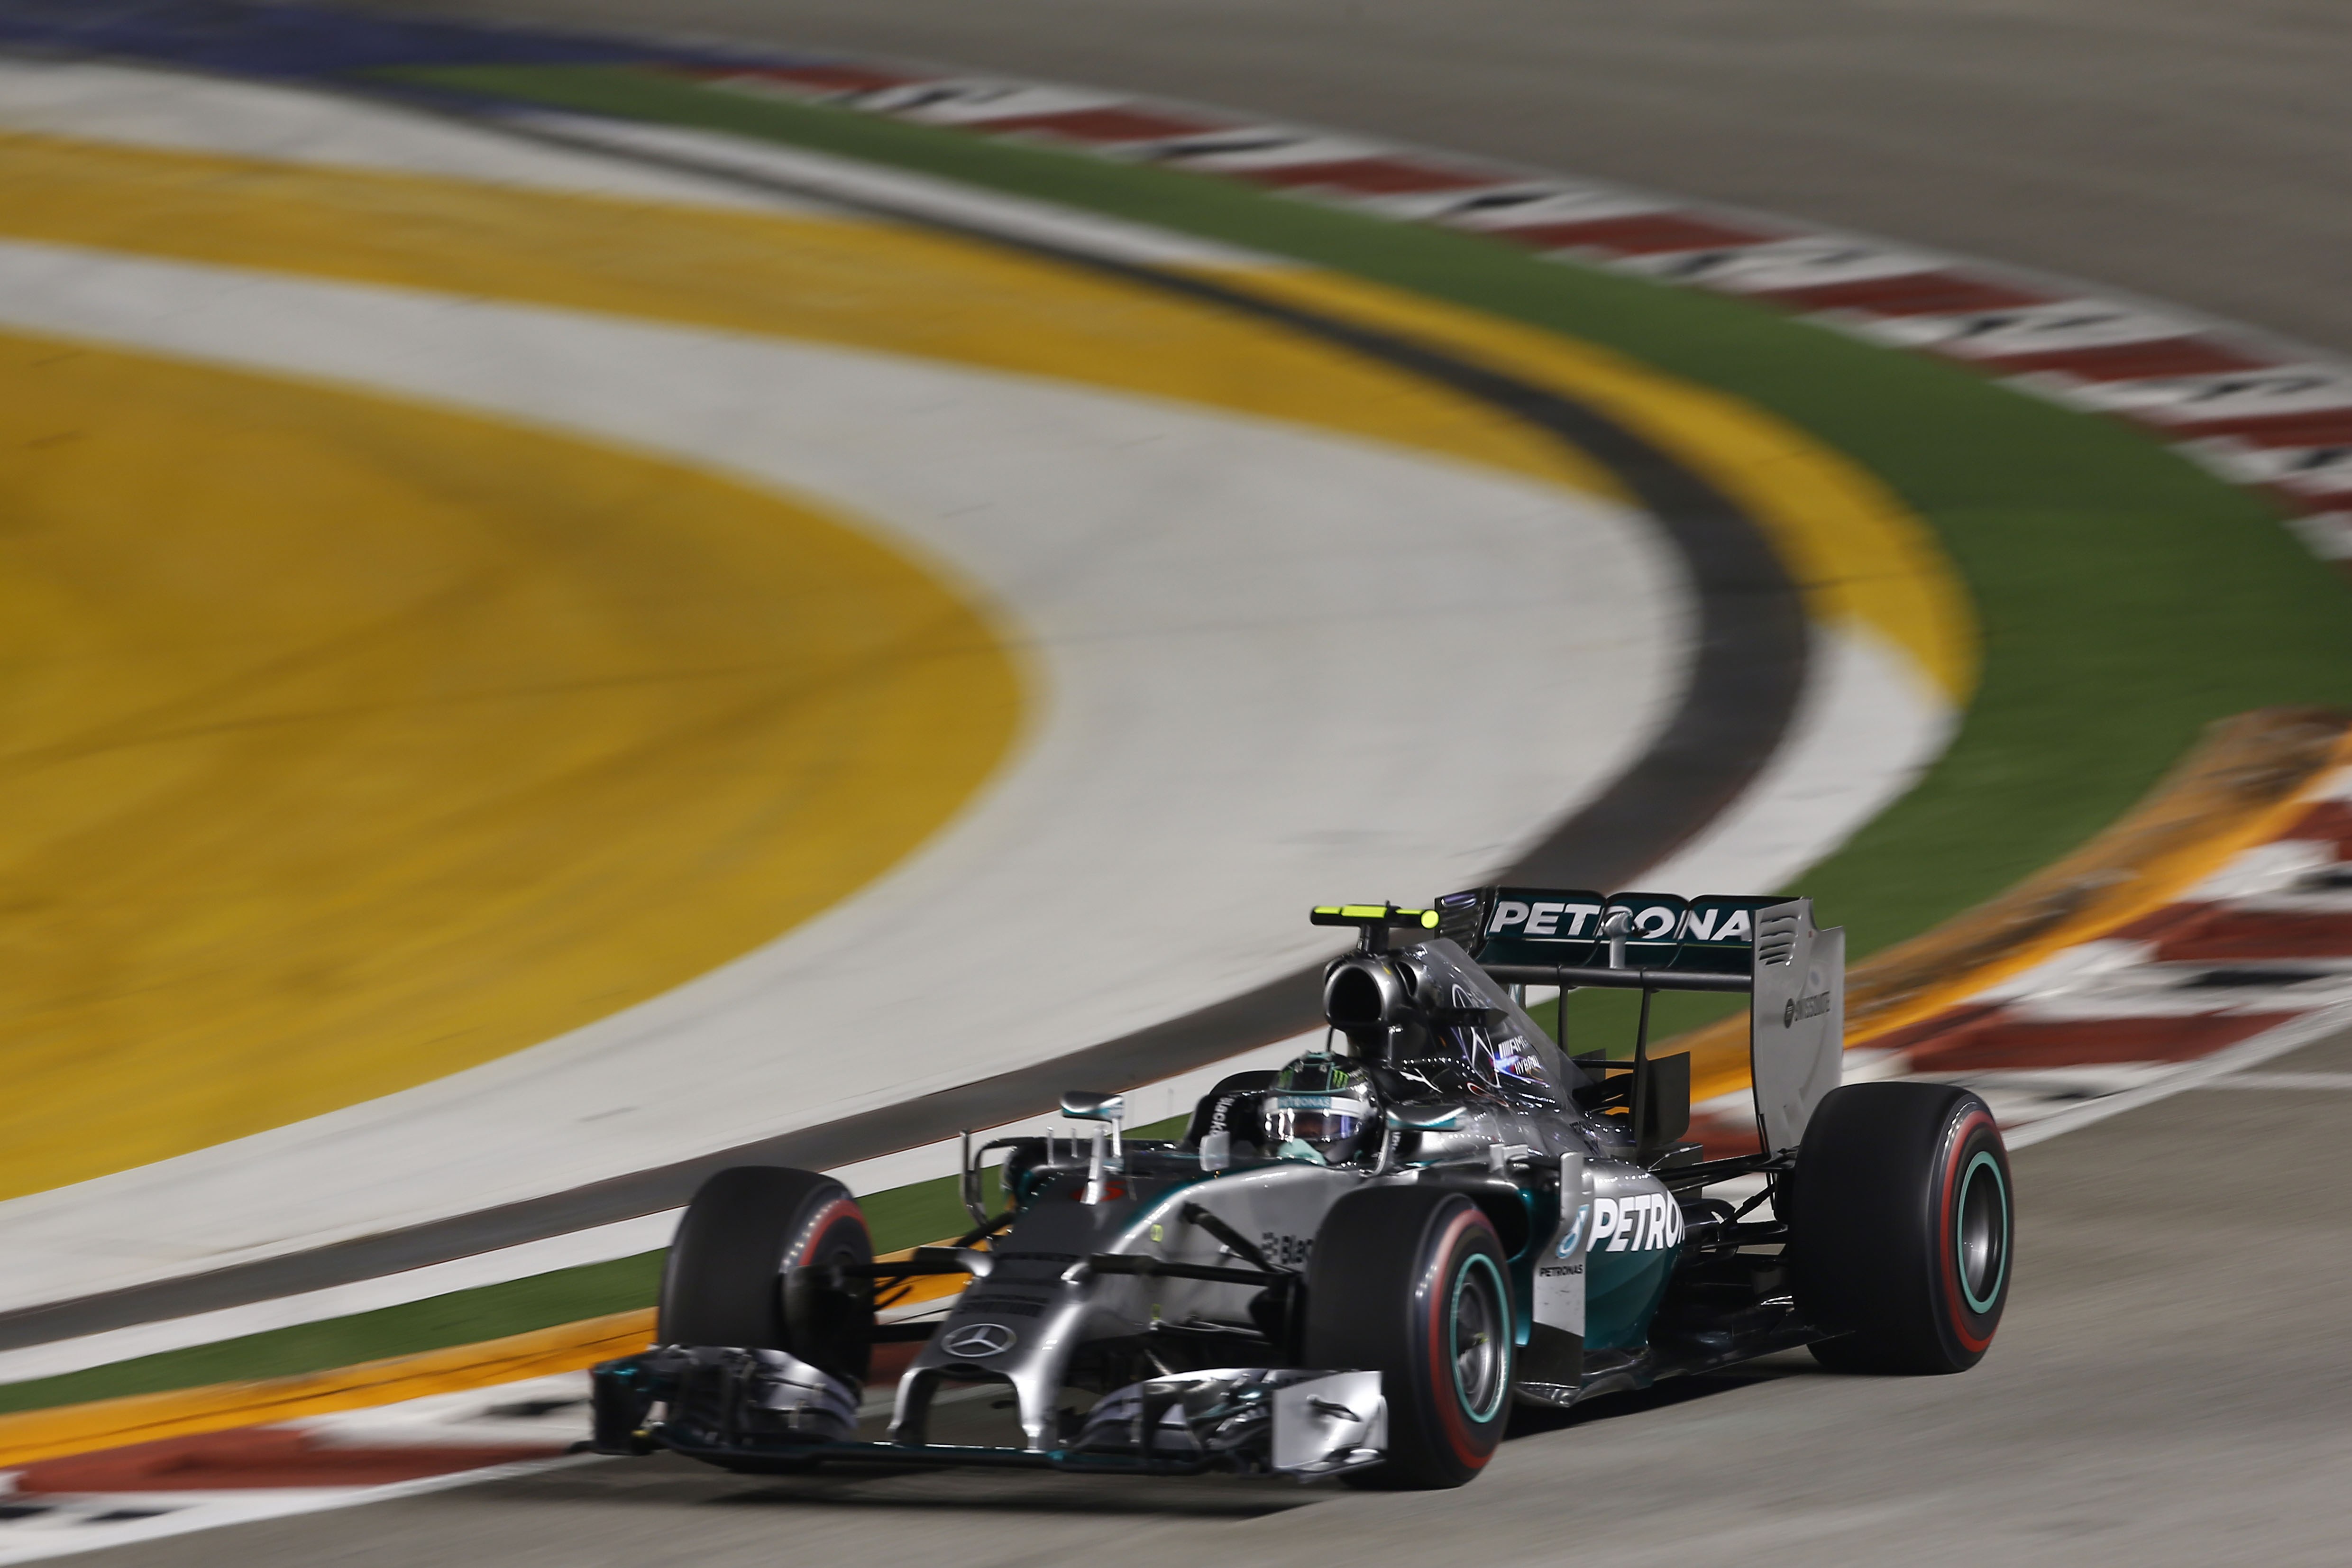 Wiring Loom Failure Caused Rosbergs Retirement Formula 1 News Mercedes Issues Amg Petronas